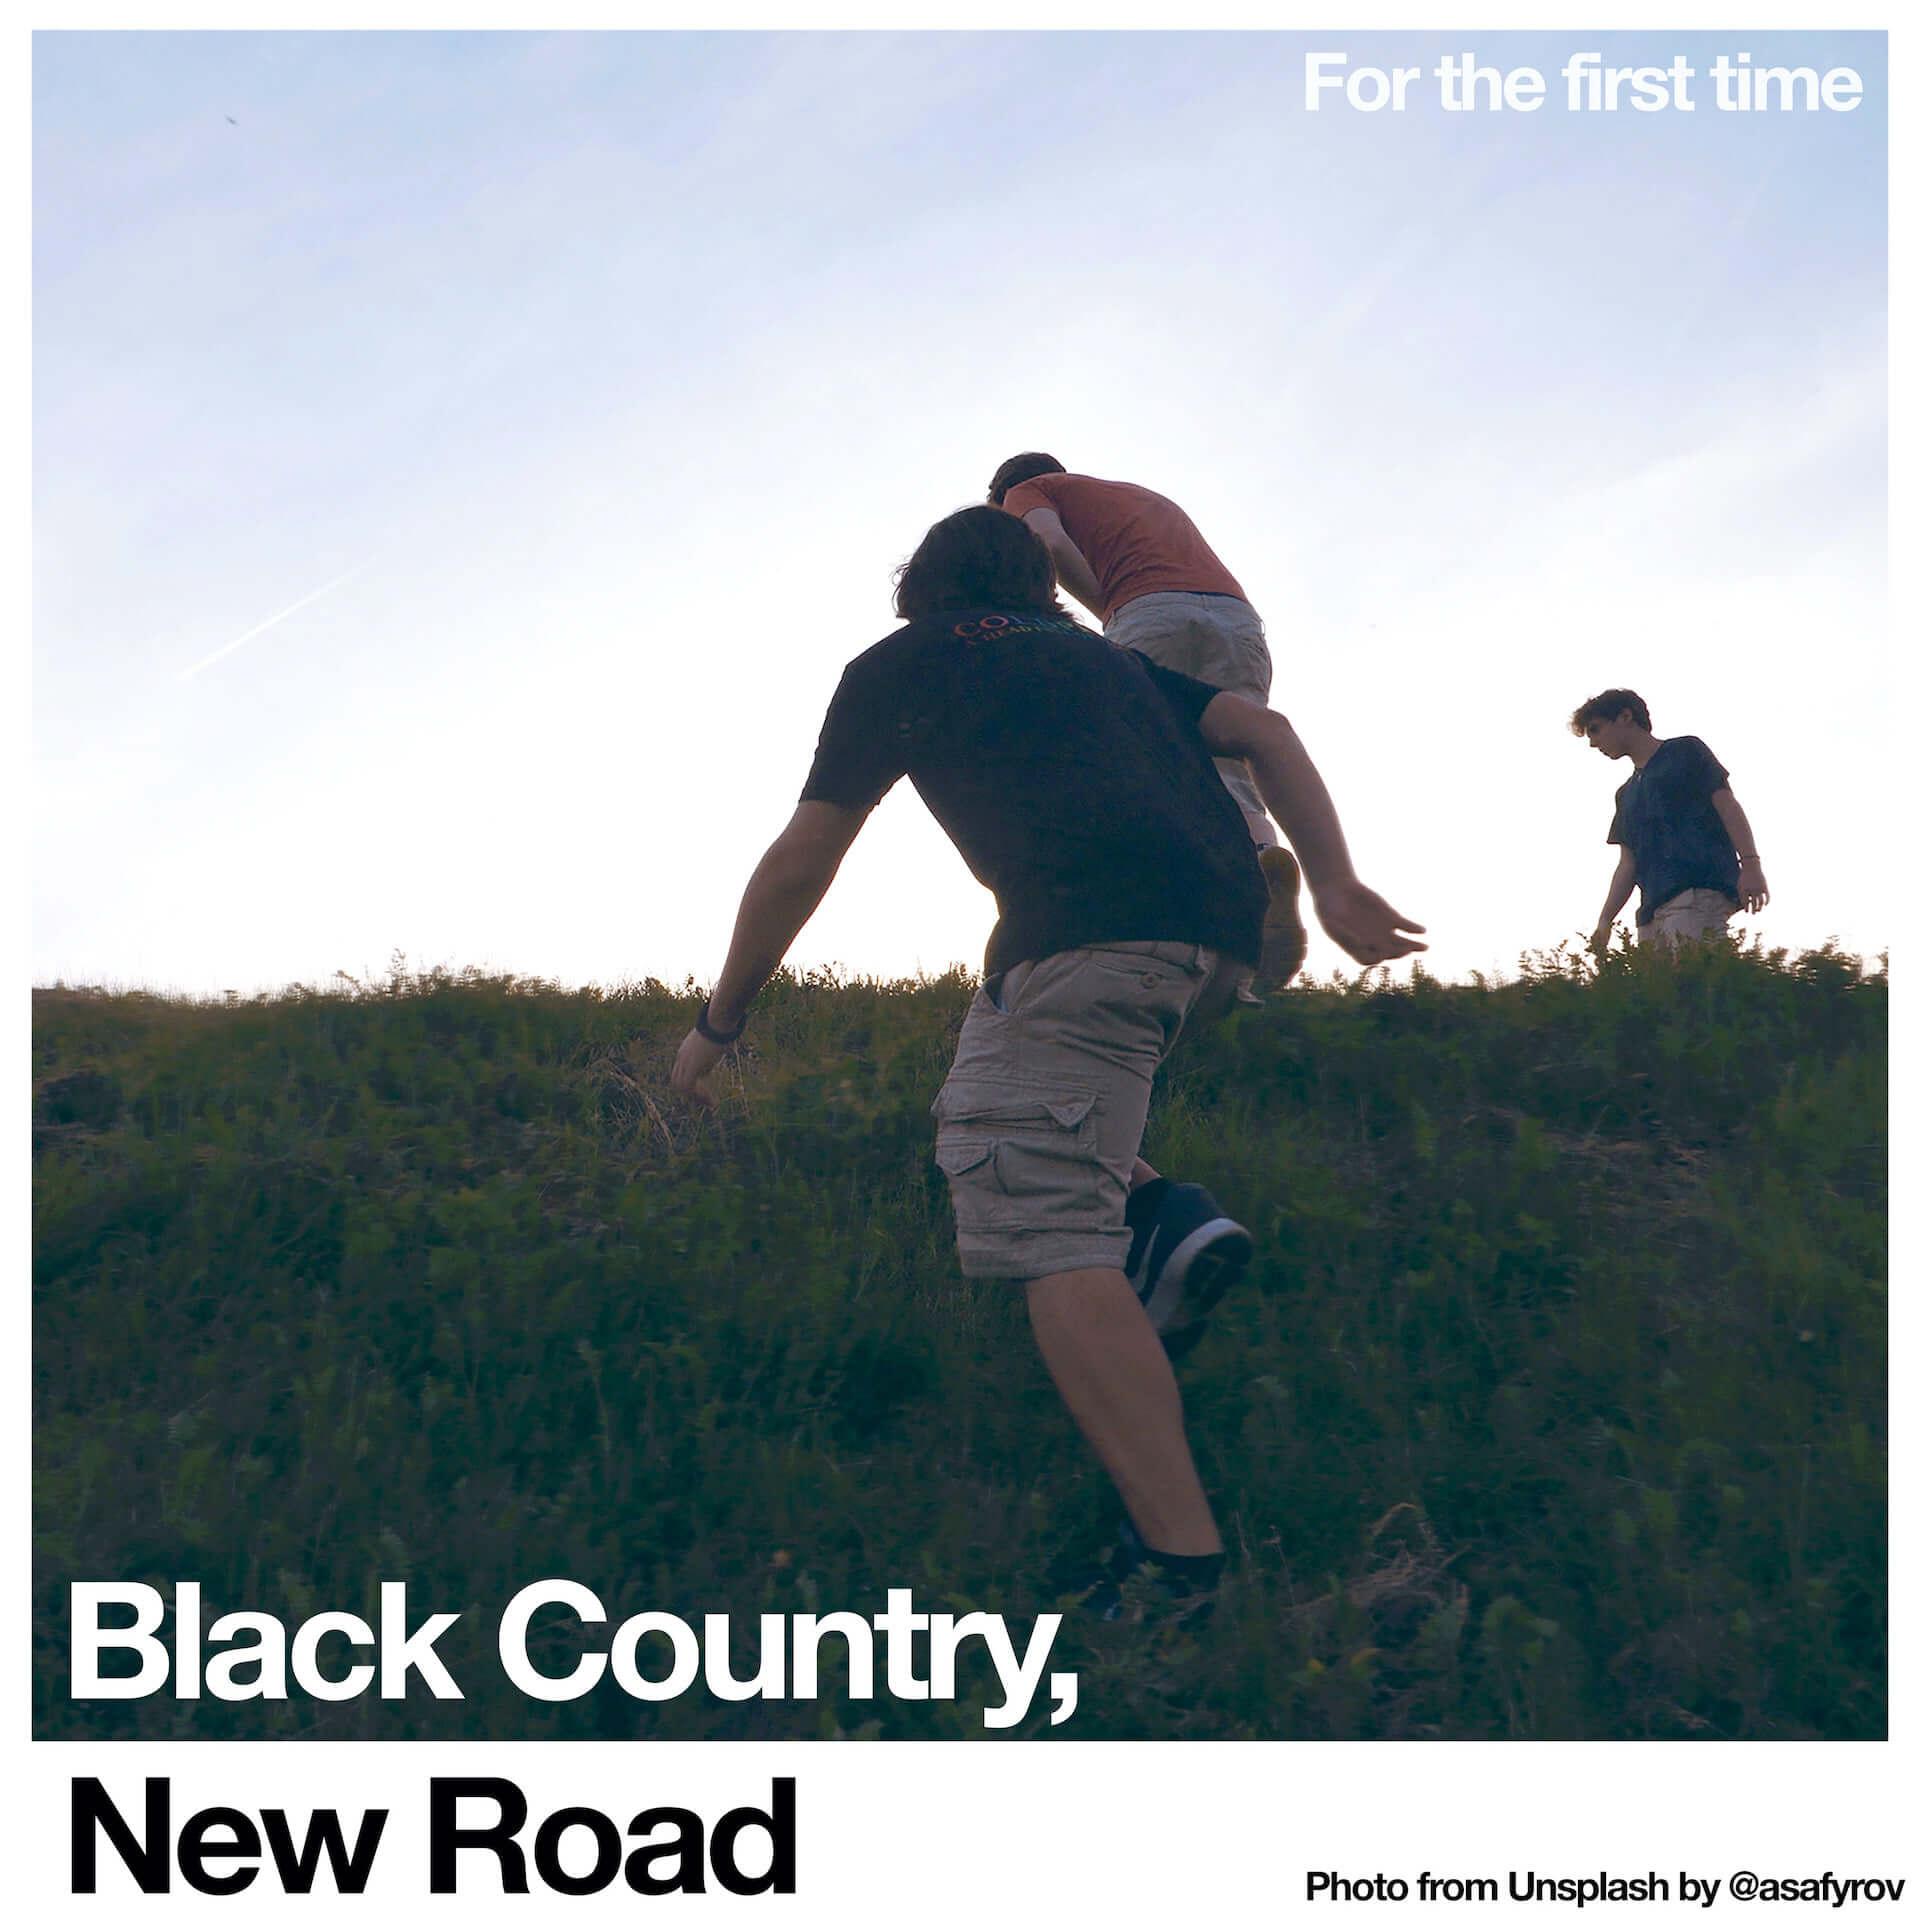 black midiとBlack Country, New Roadがコラボ!24時間限定のライブ配信がBandcampにて実施決定 music201209_blackmidi-bcnr_4-1920x1920